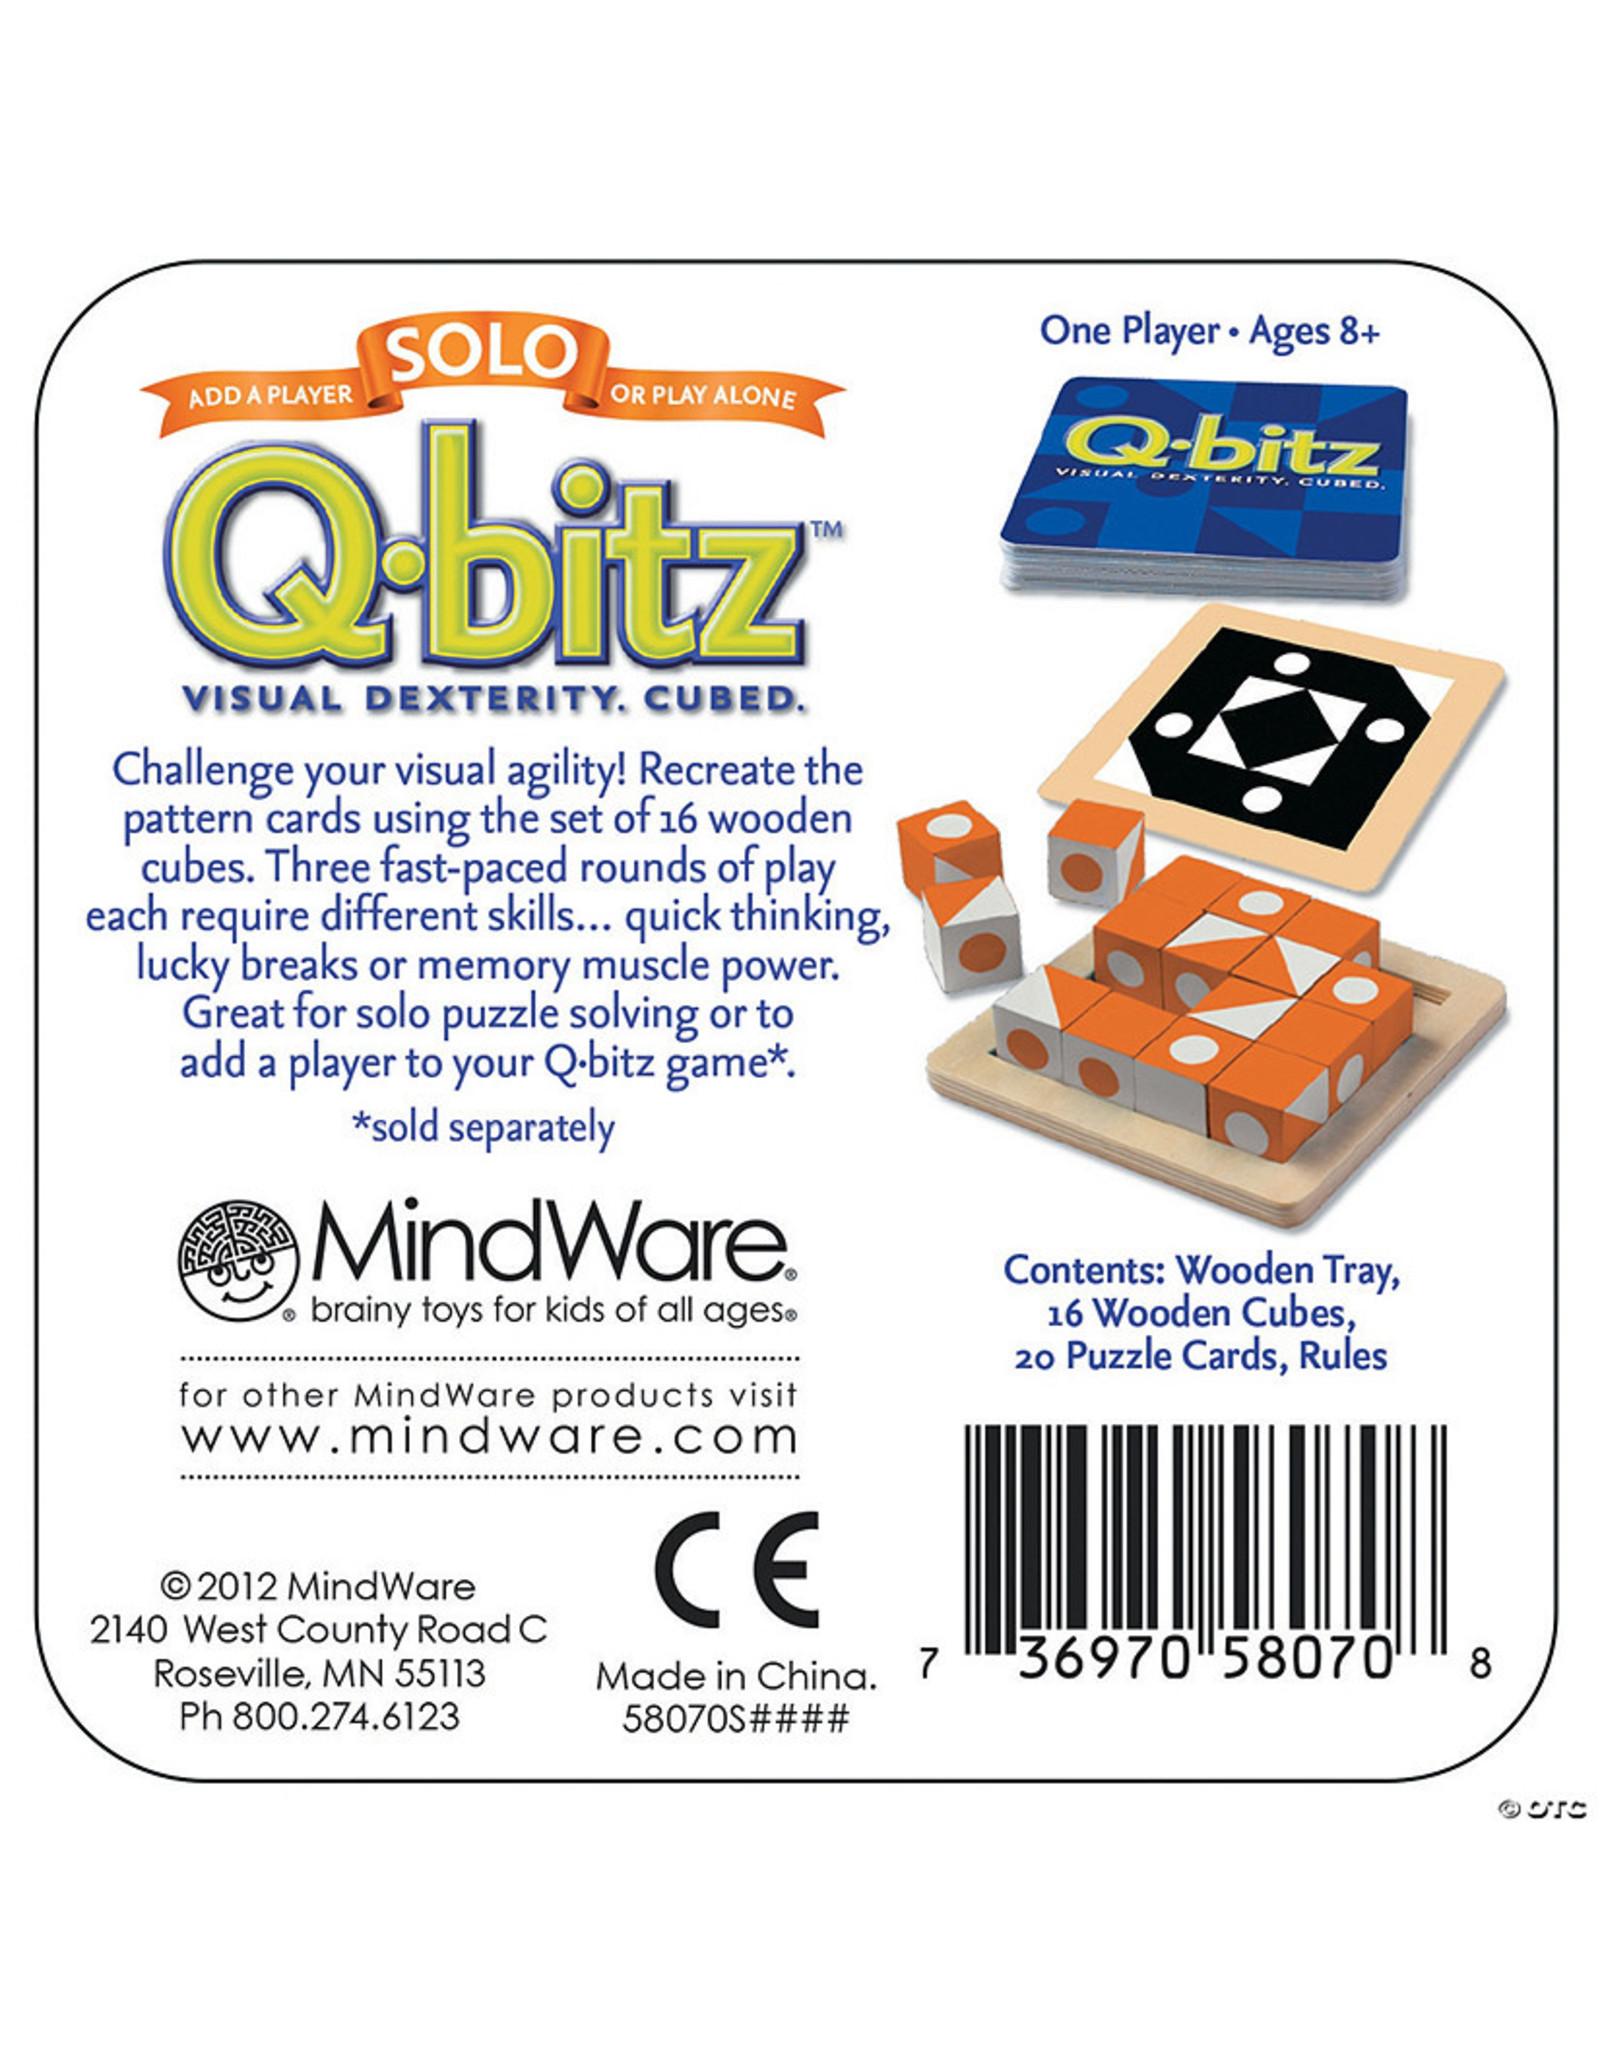 Mindware Q-bitz Solo